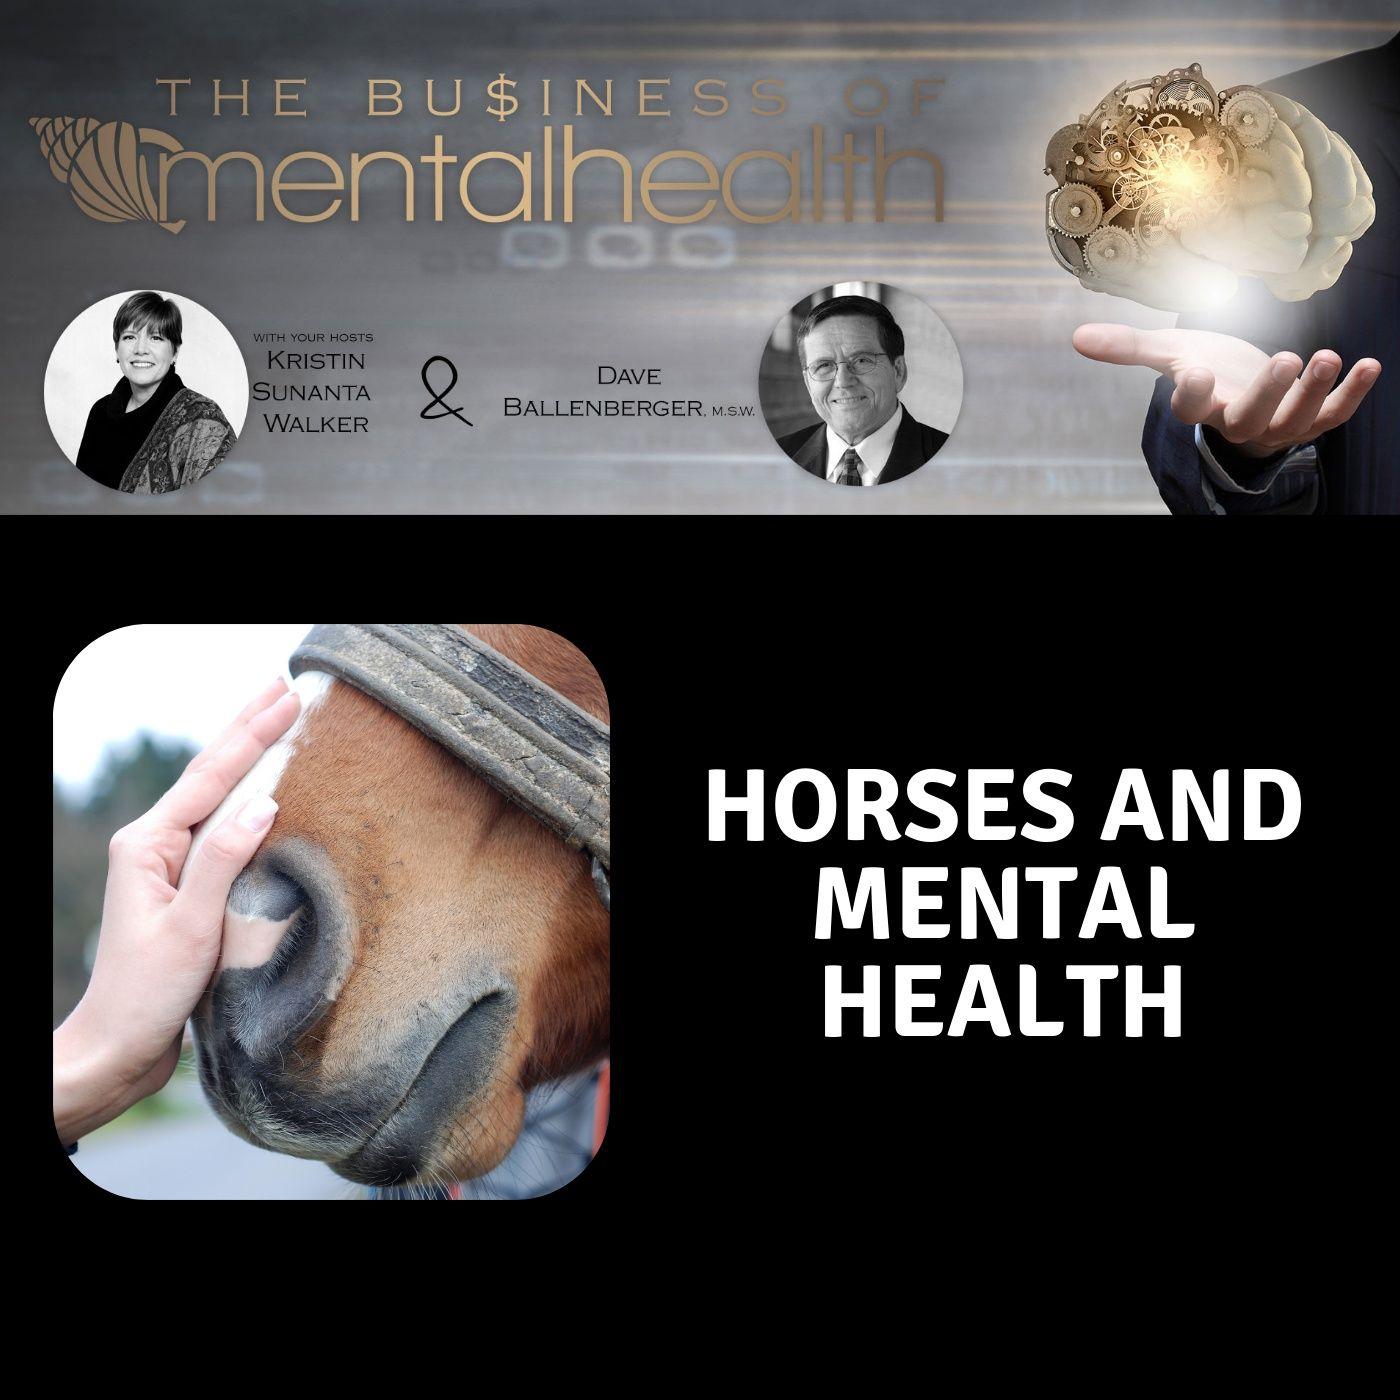 Mental Health News Radio - Mental Health Business: Horses and Mental Health